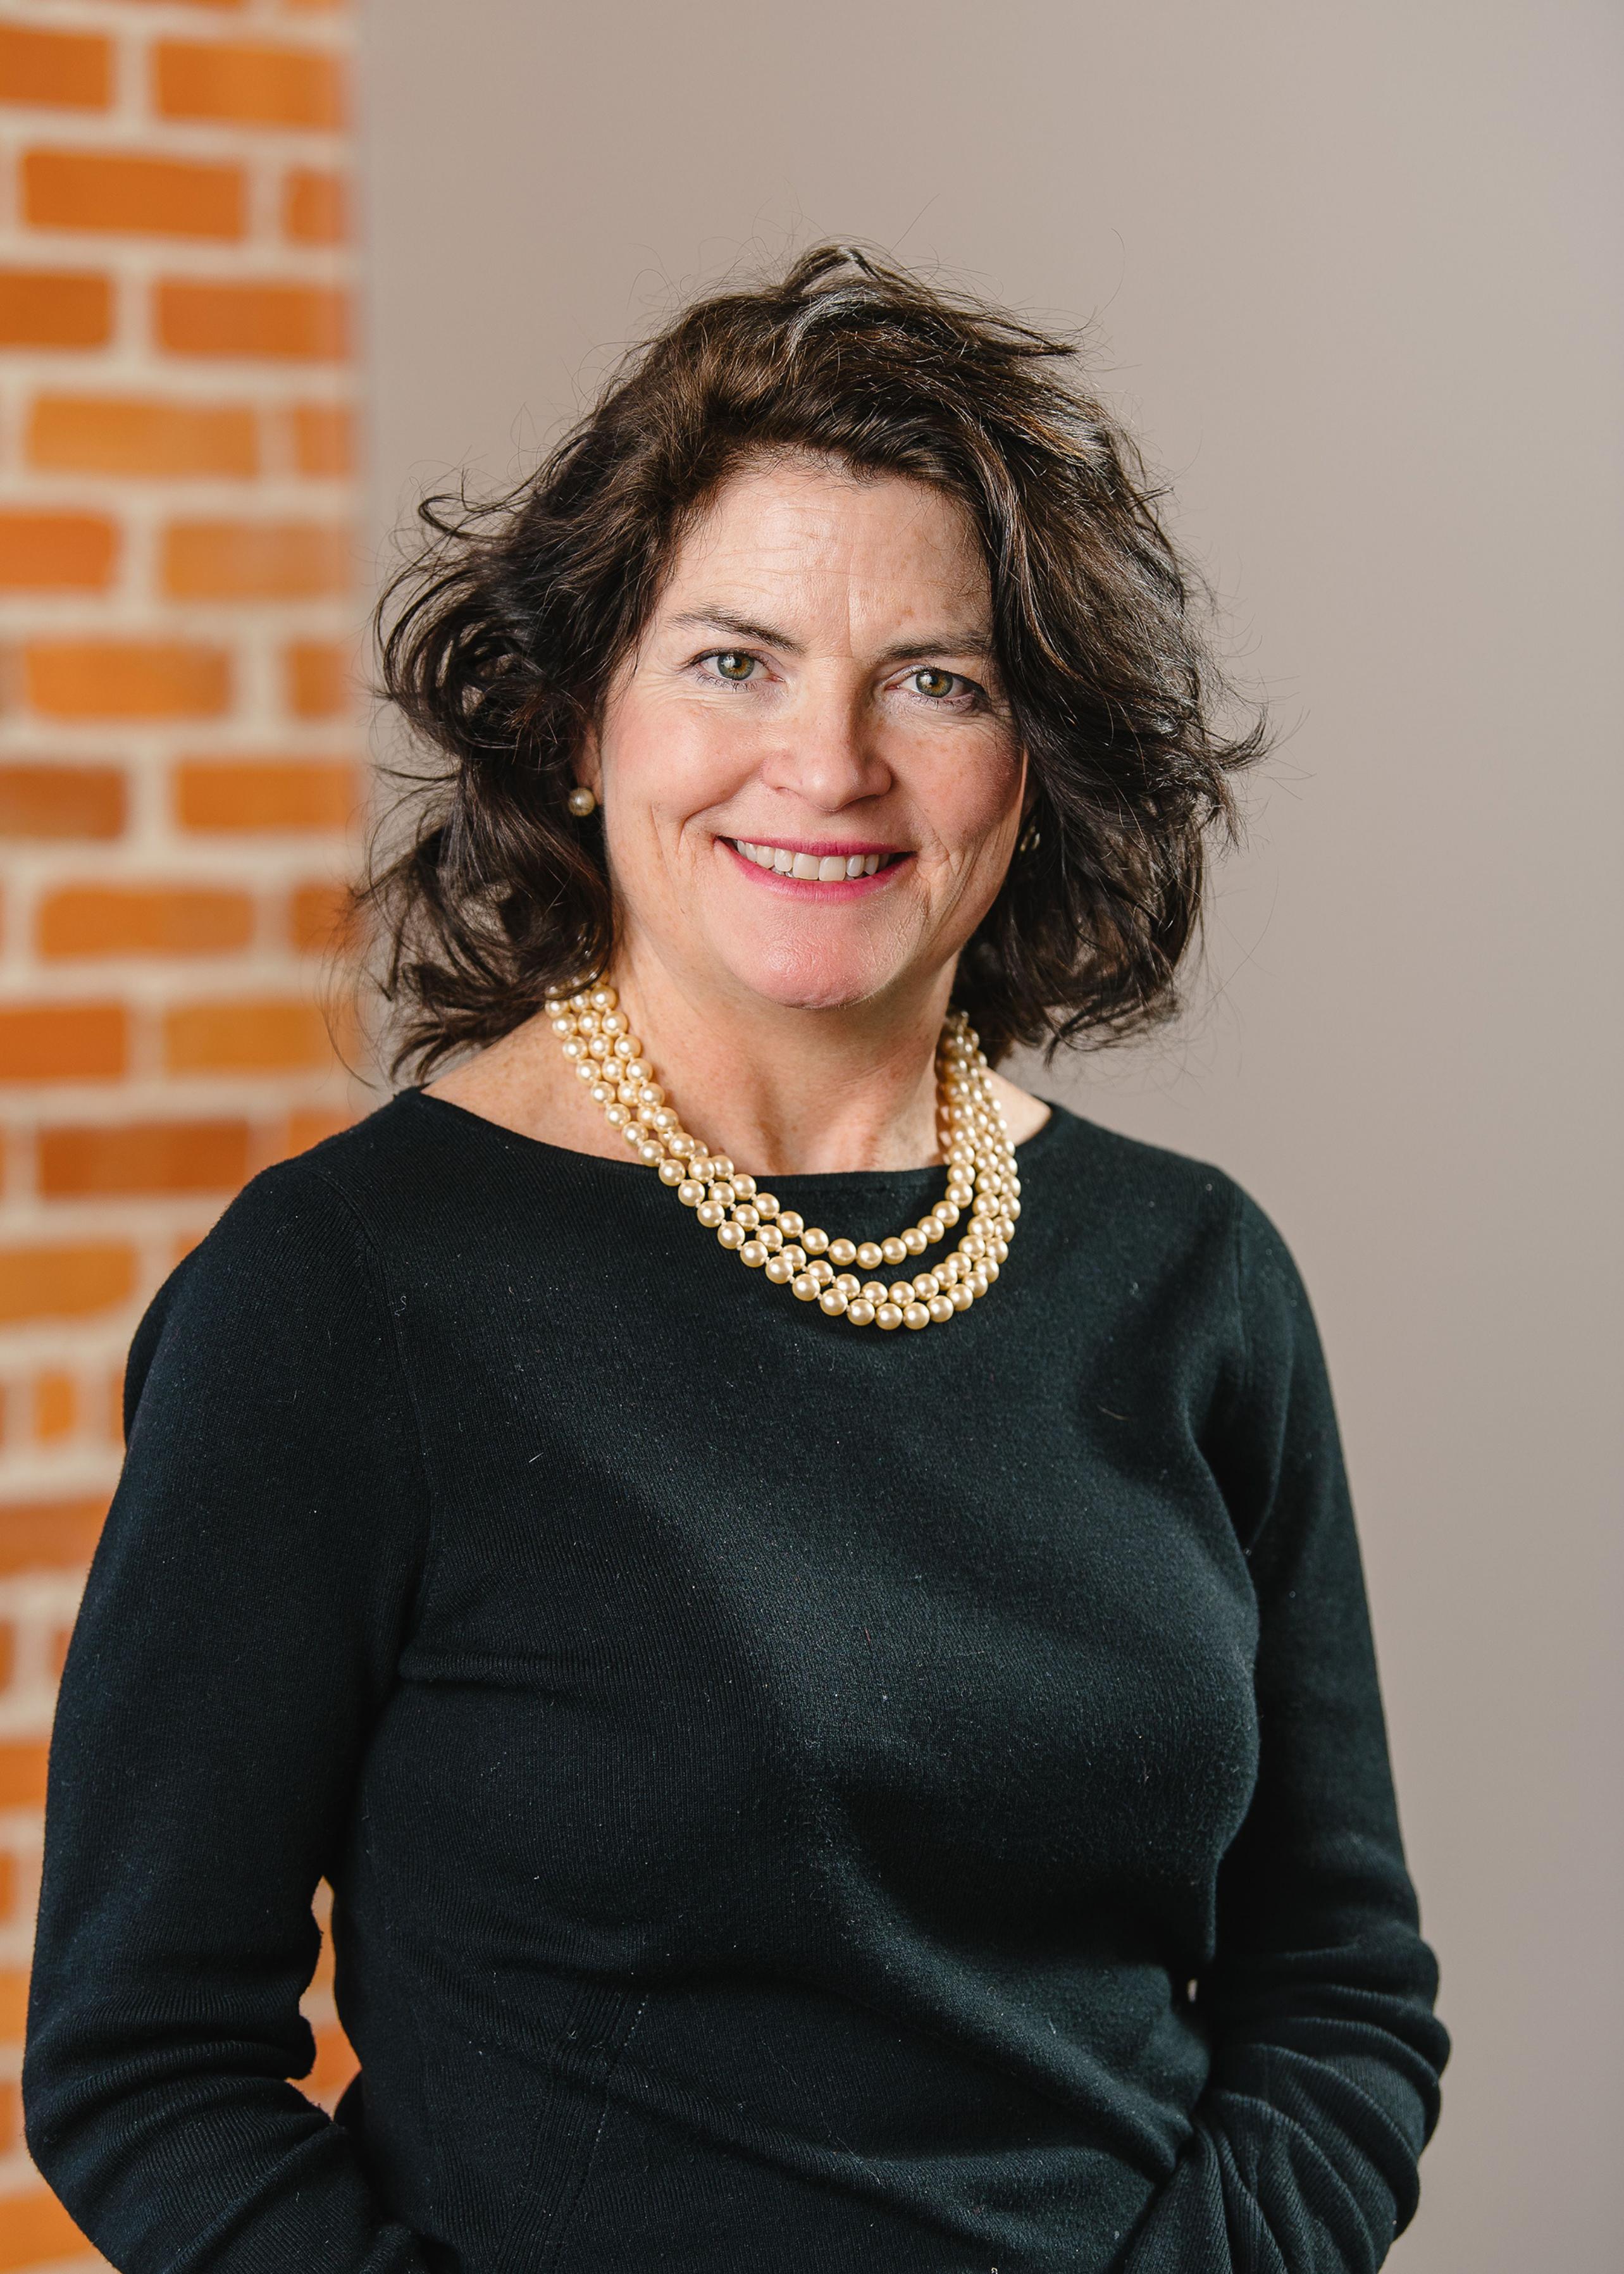 Mary Rose Corrigan, RN